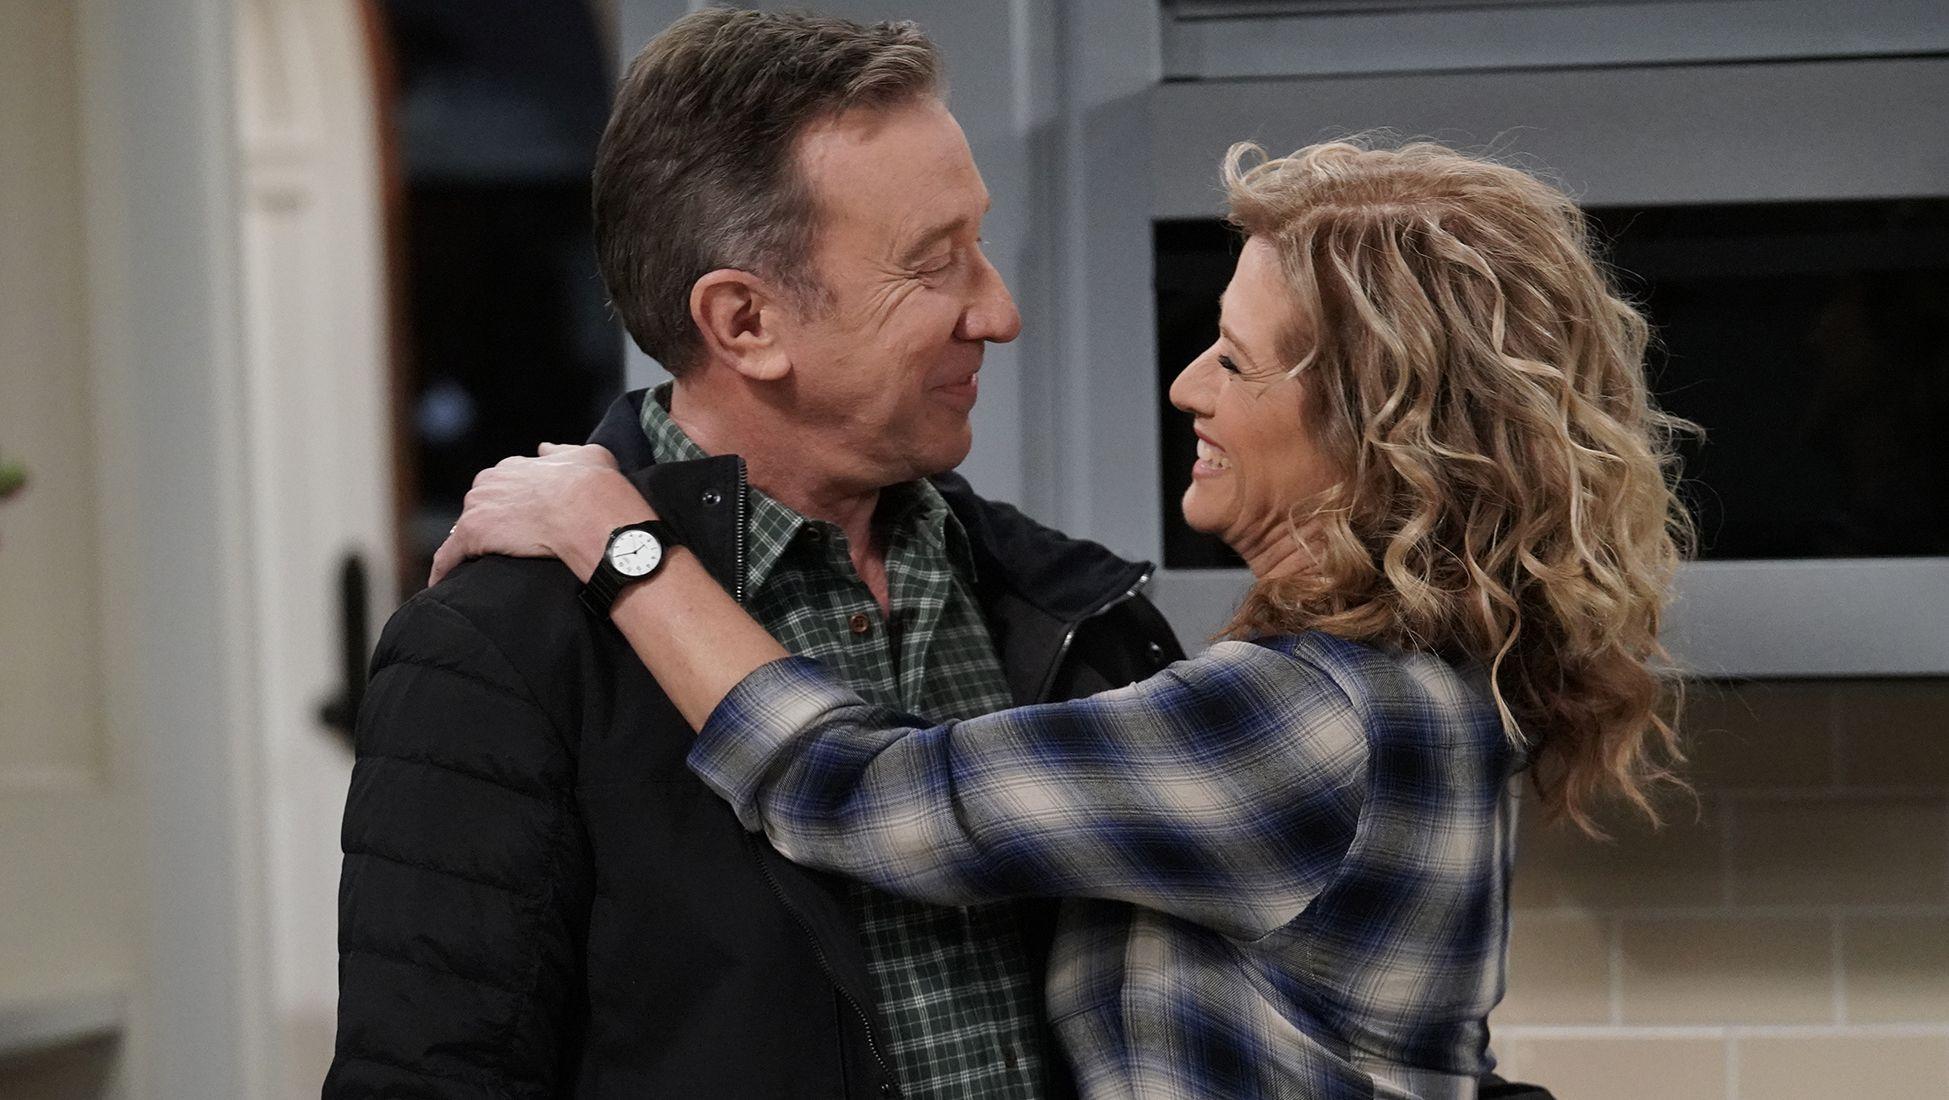 Fox Won't Air 'Last Man Standing' Season 8 Until 2020